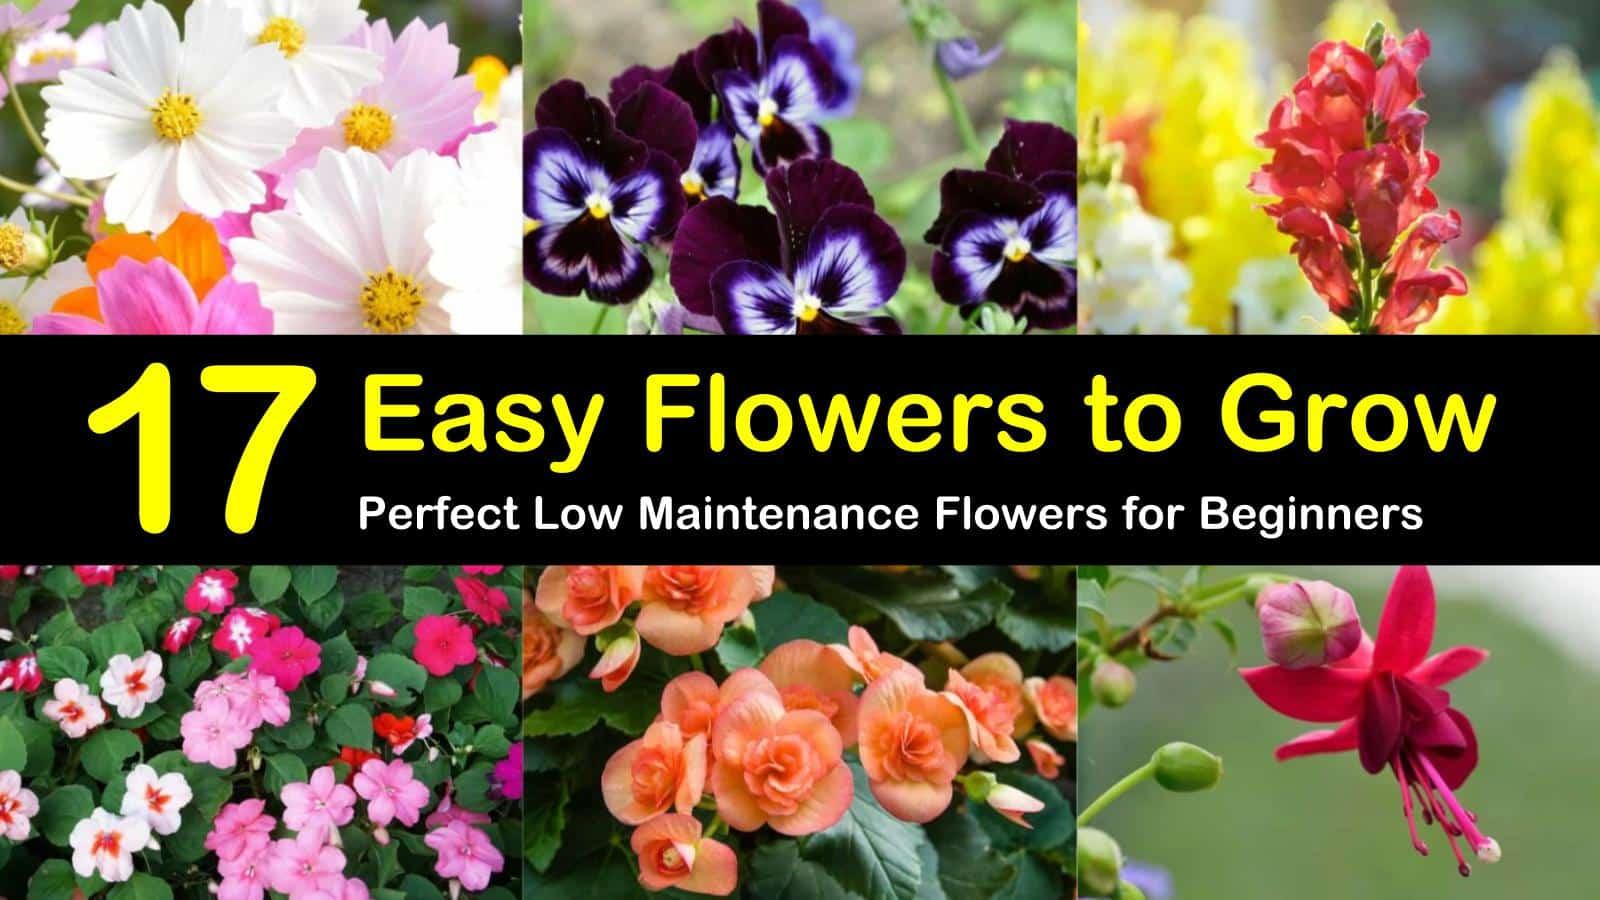 easy flowers to grow titleimg1